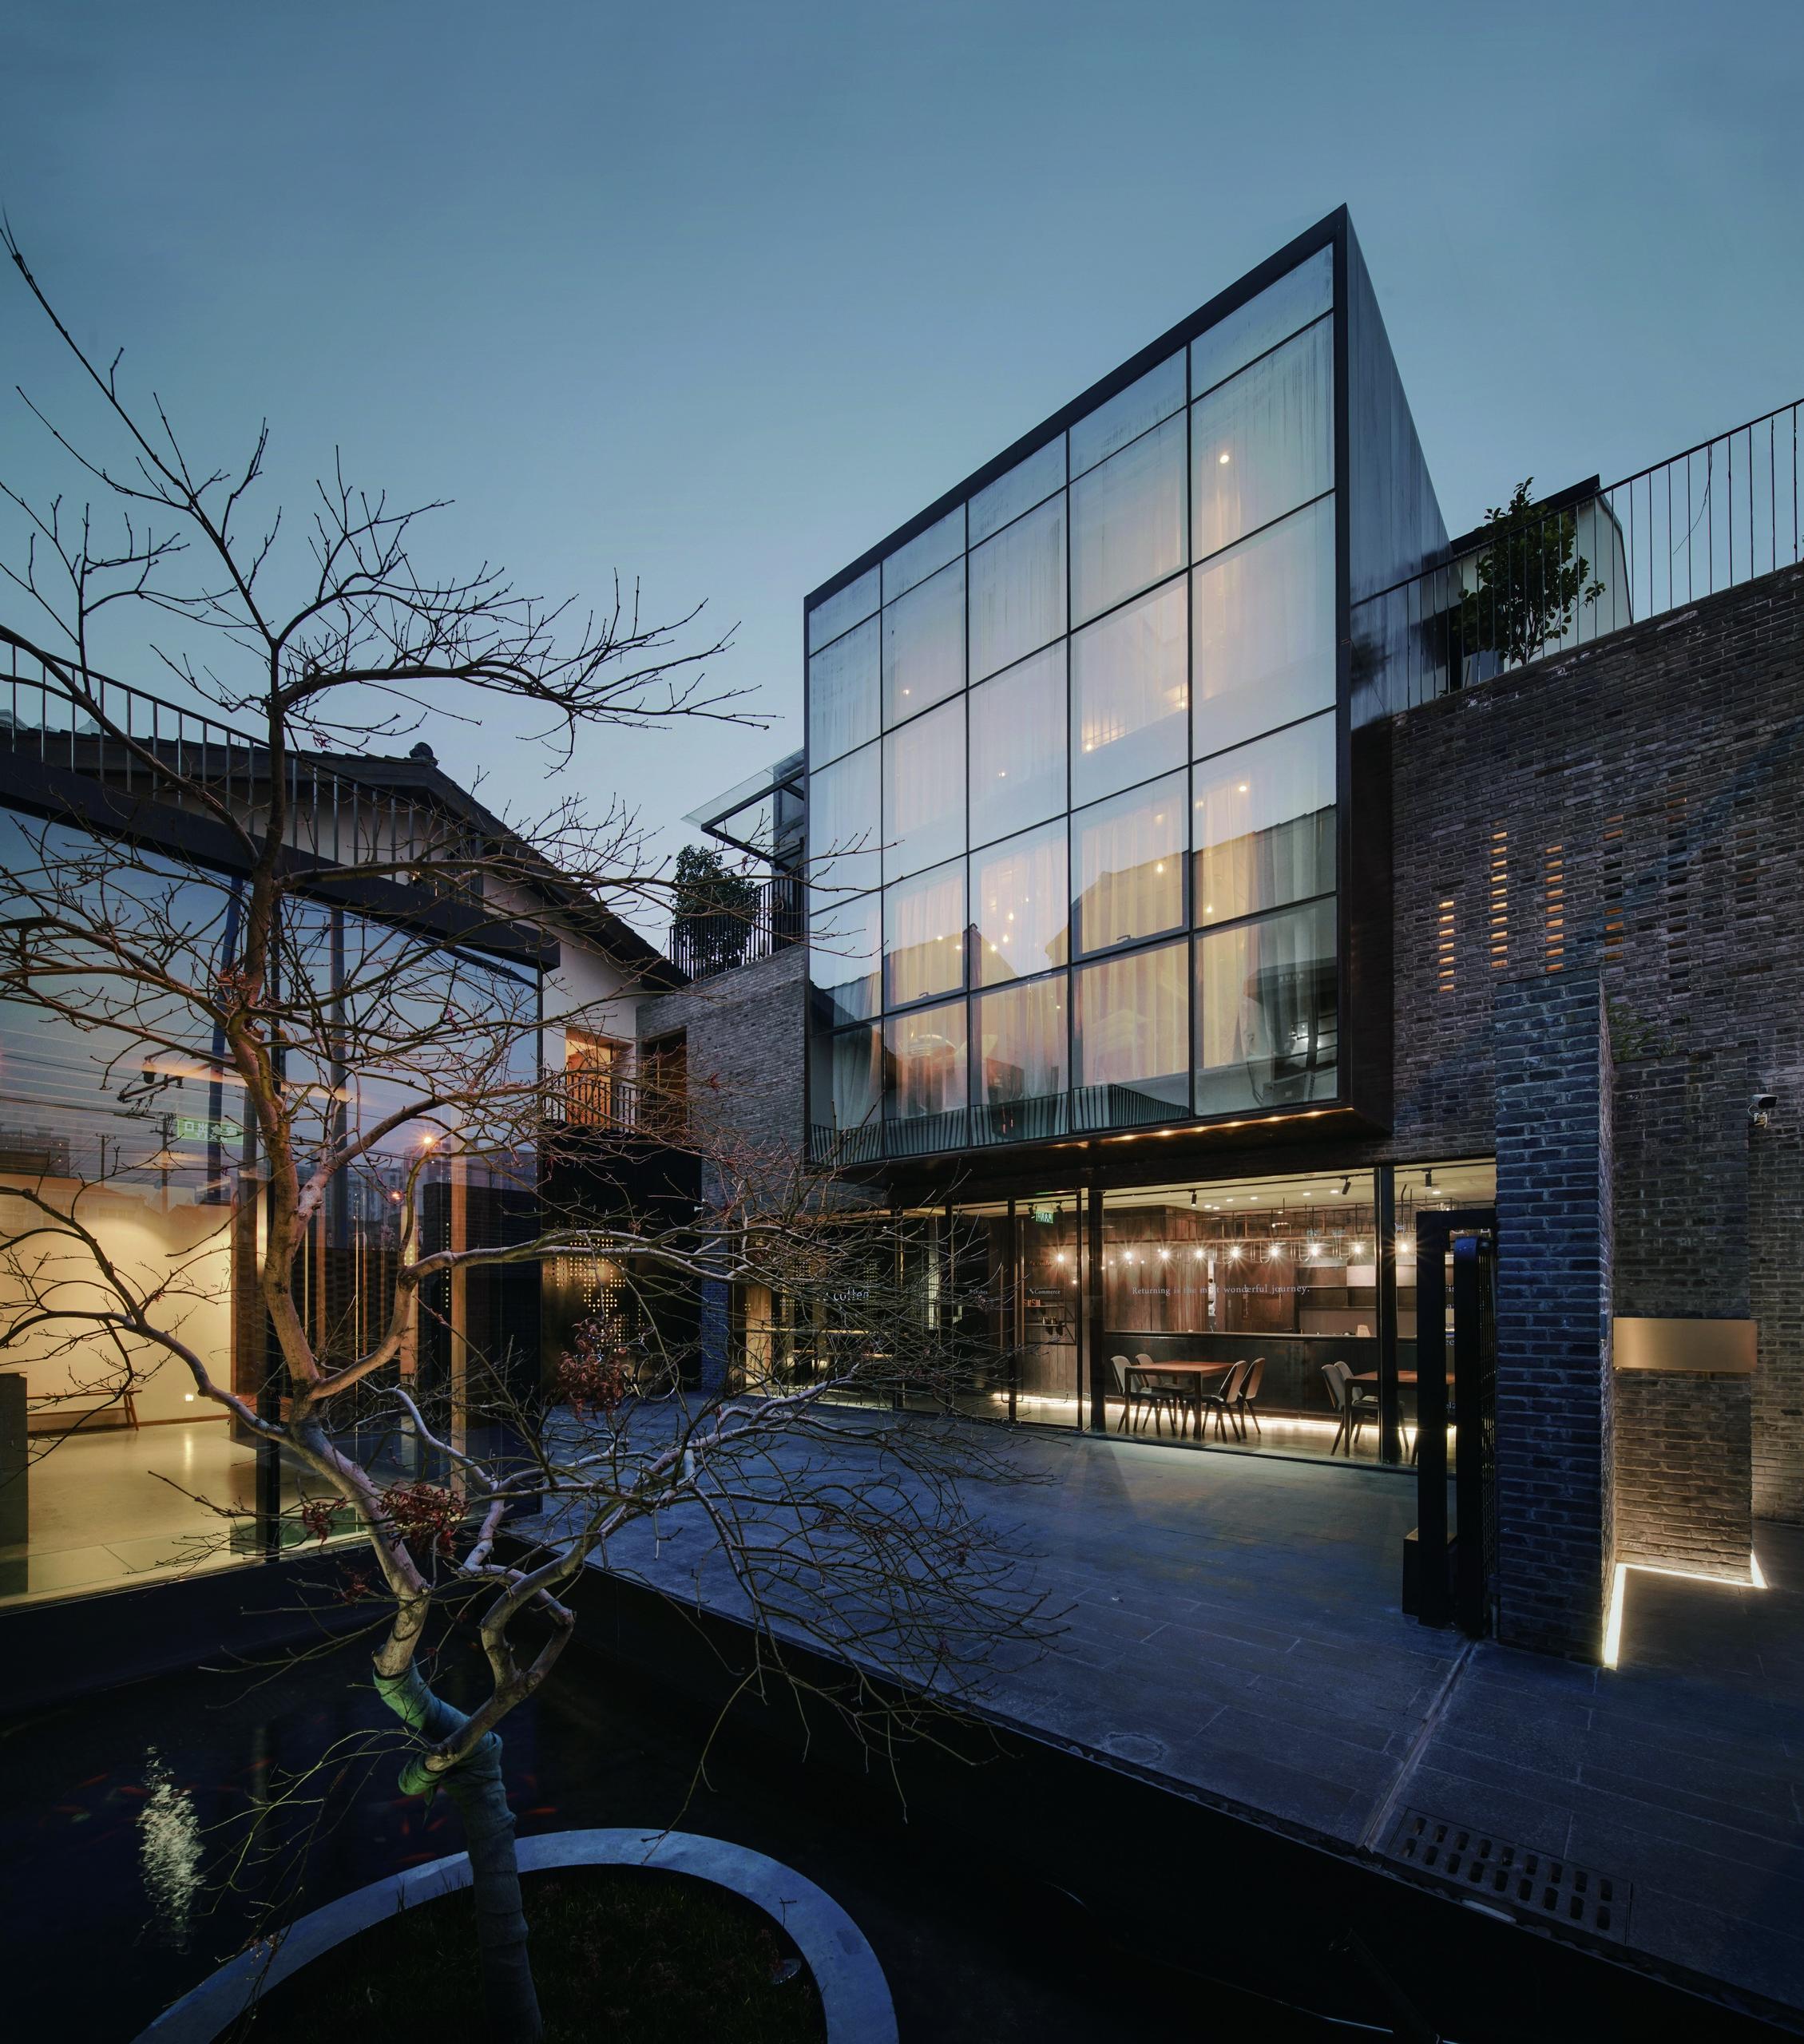 Modern Architecture Defining Contemporary Lifestyle In: Shanghai Benzhe Architecture Design